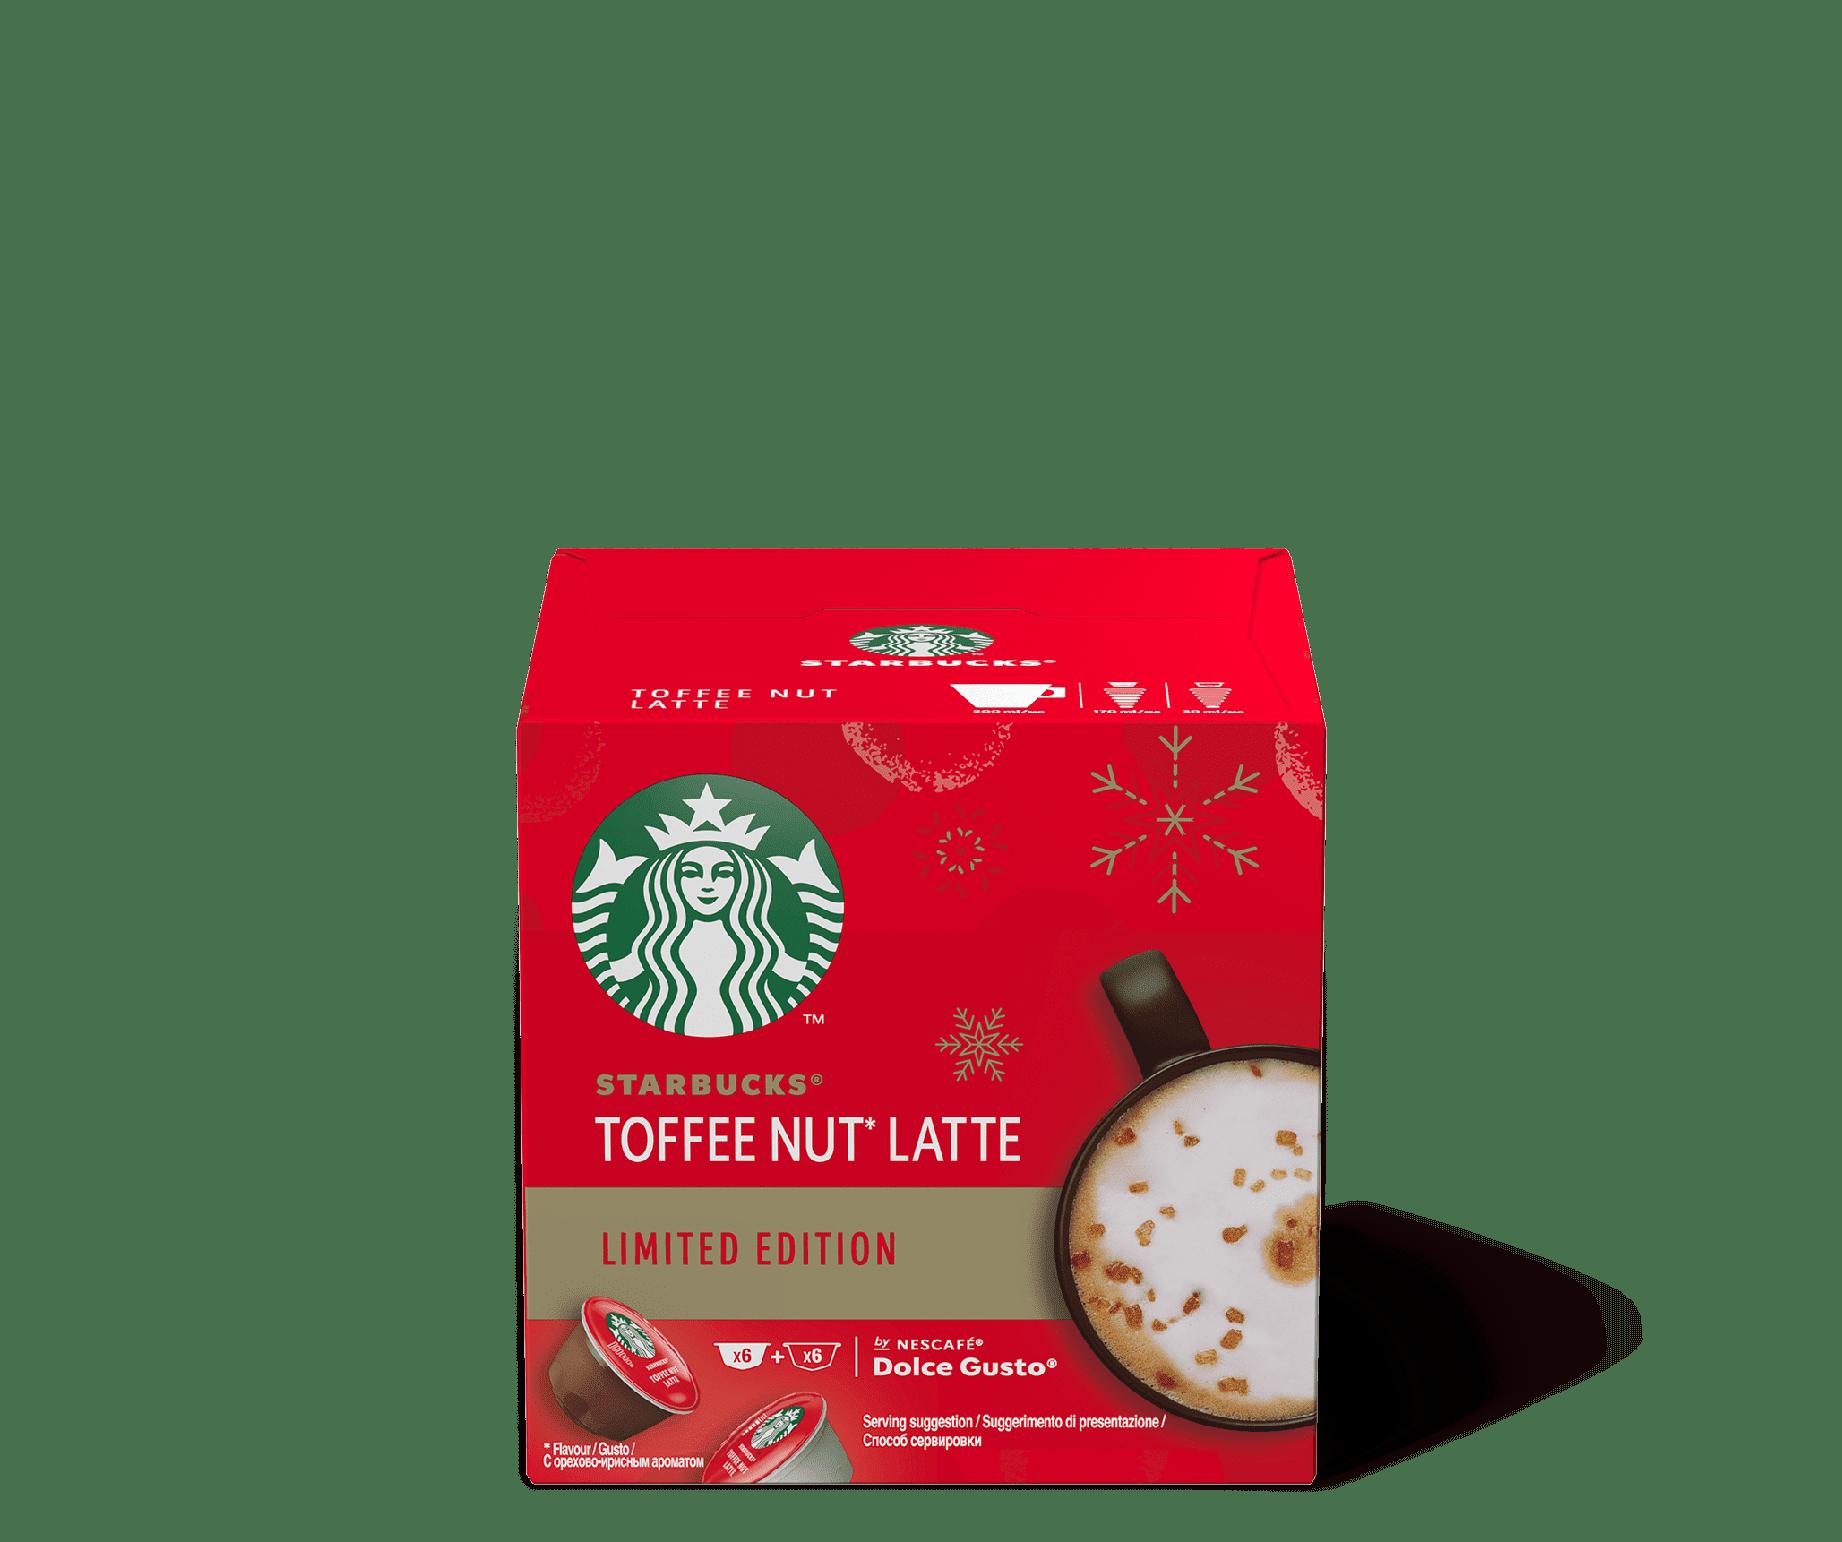 SBUX_NDG_Toffe-Nut-Latte